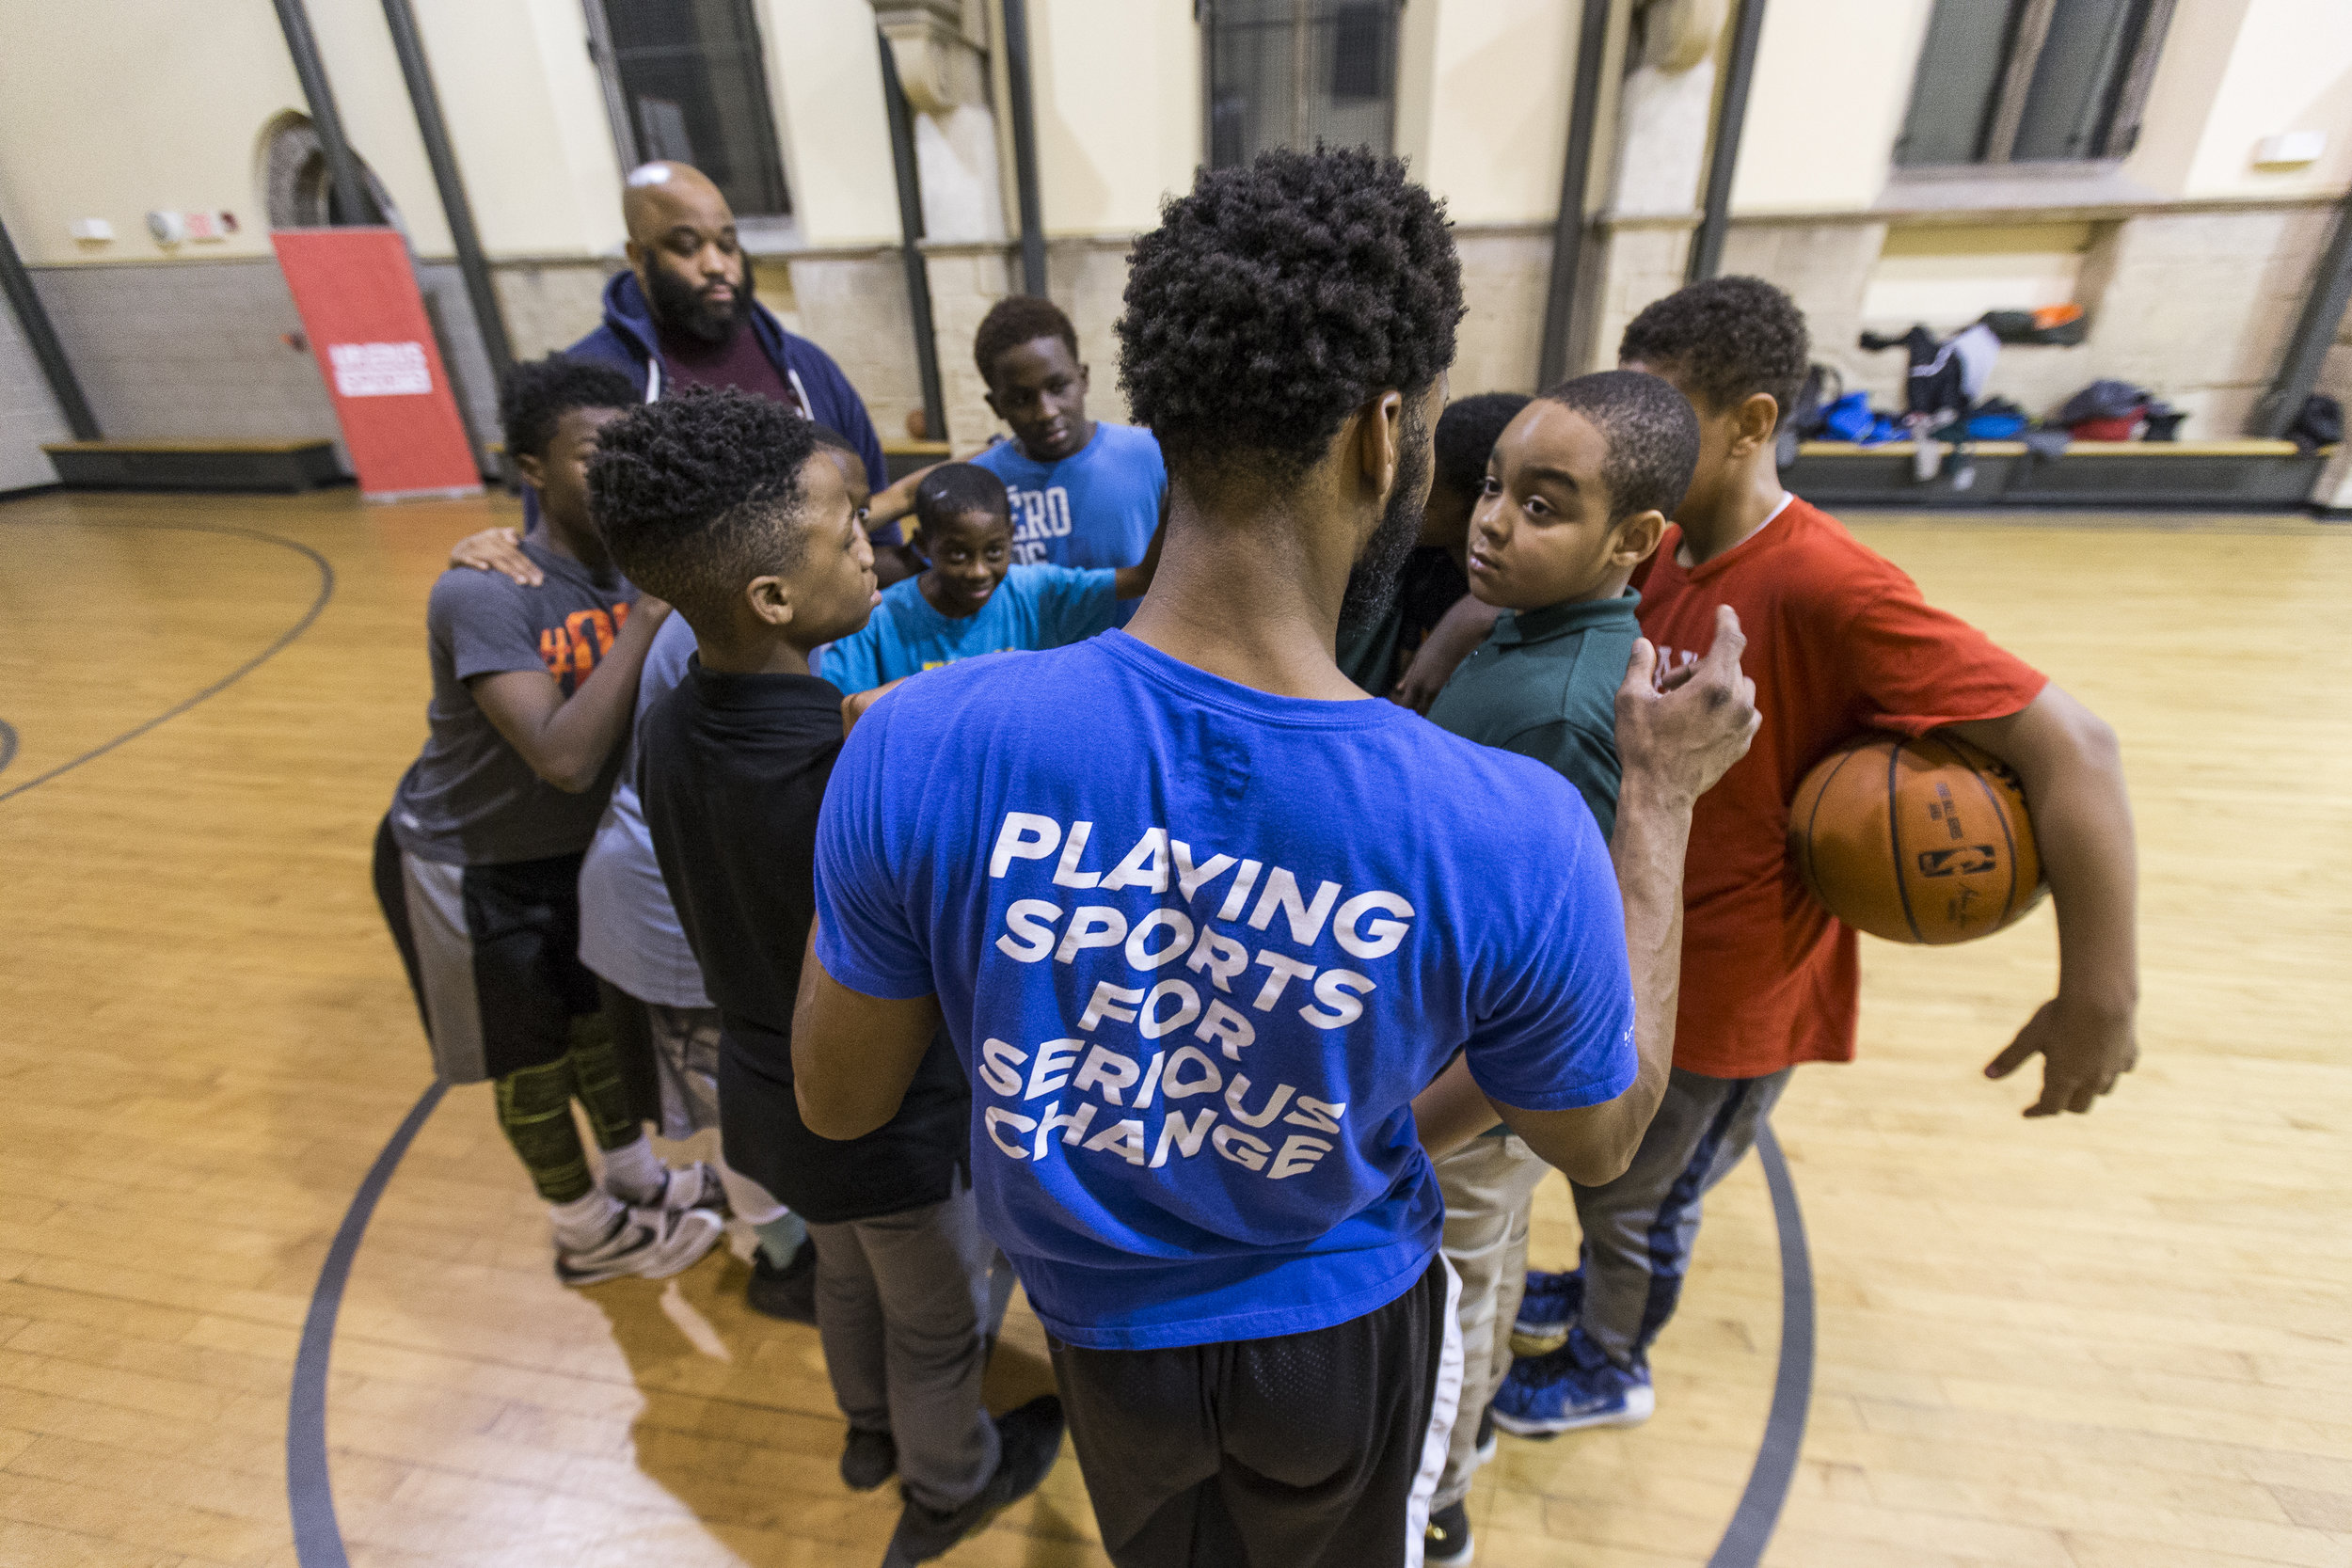 Basketball-Coach-with-Huddle.jpg